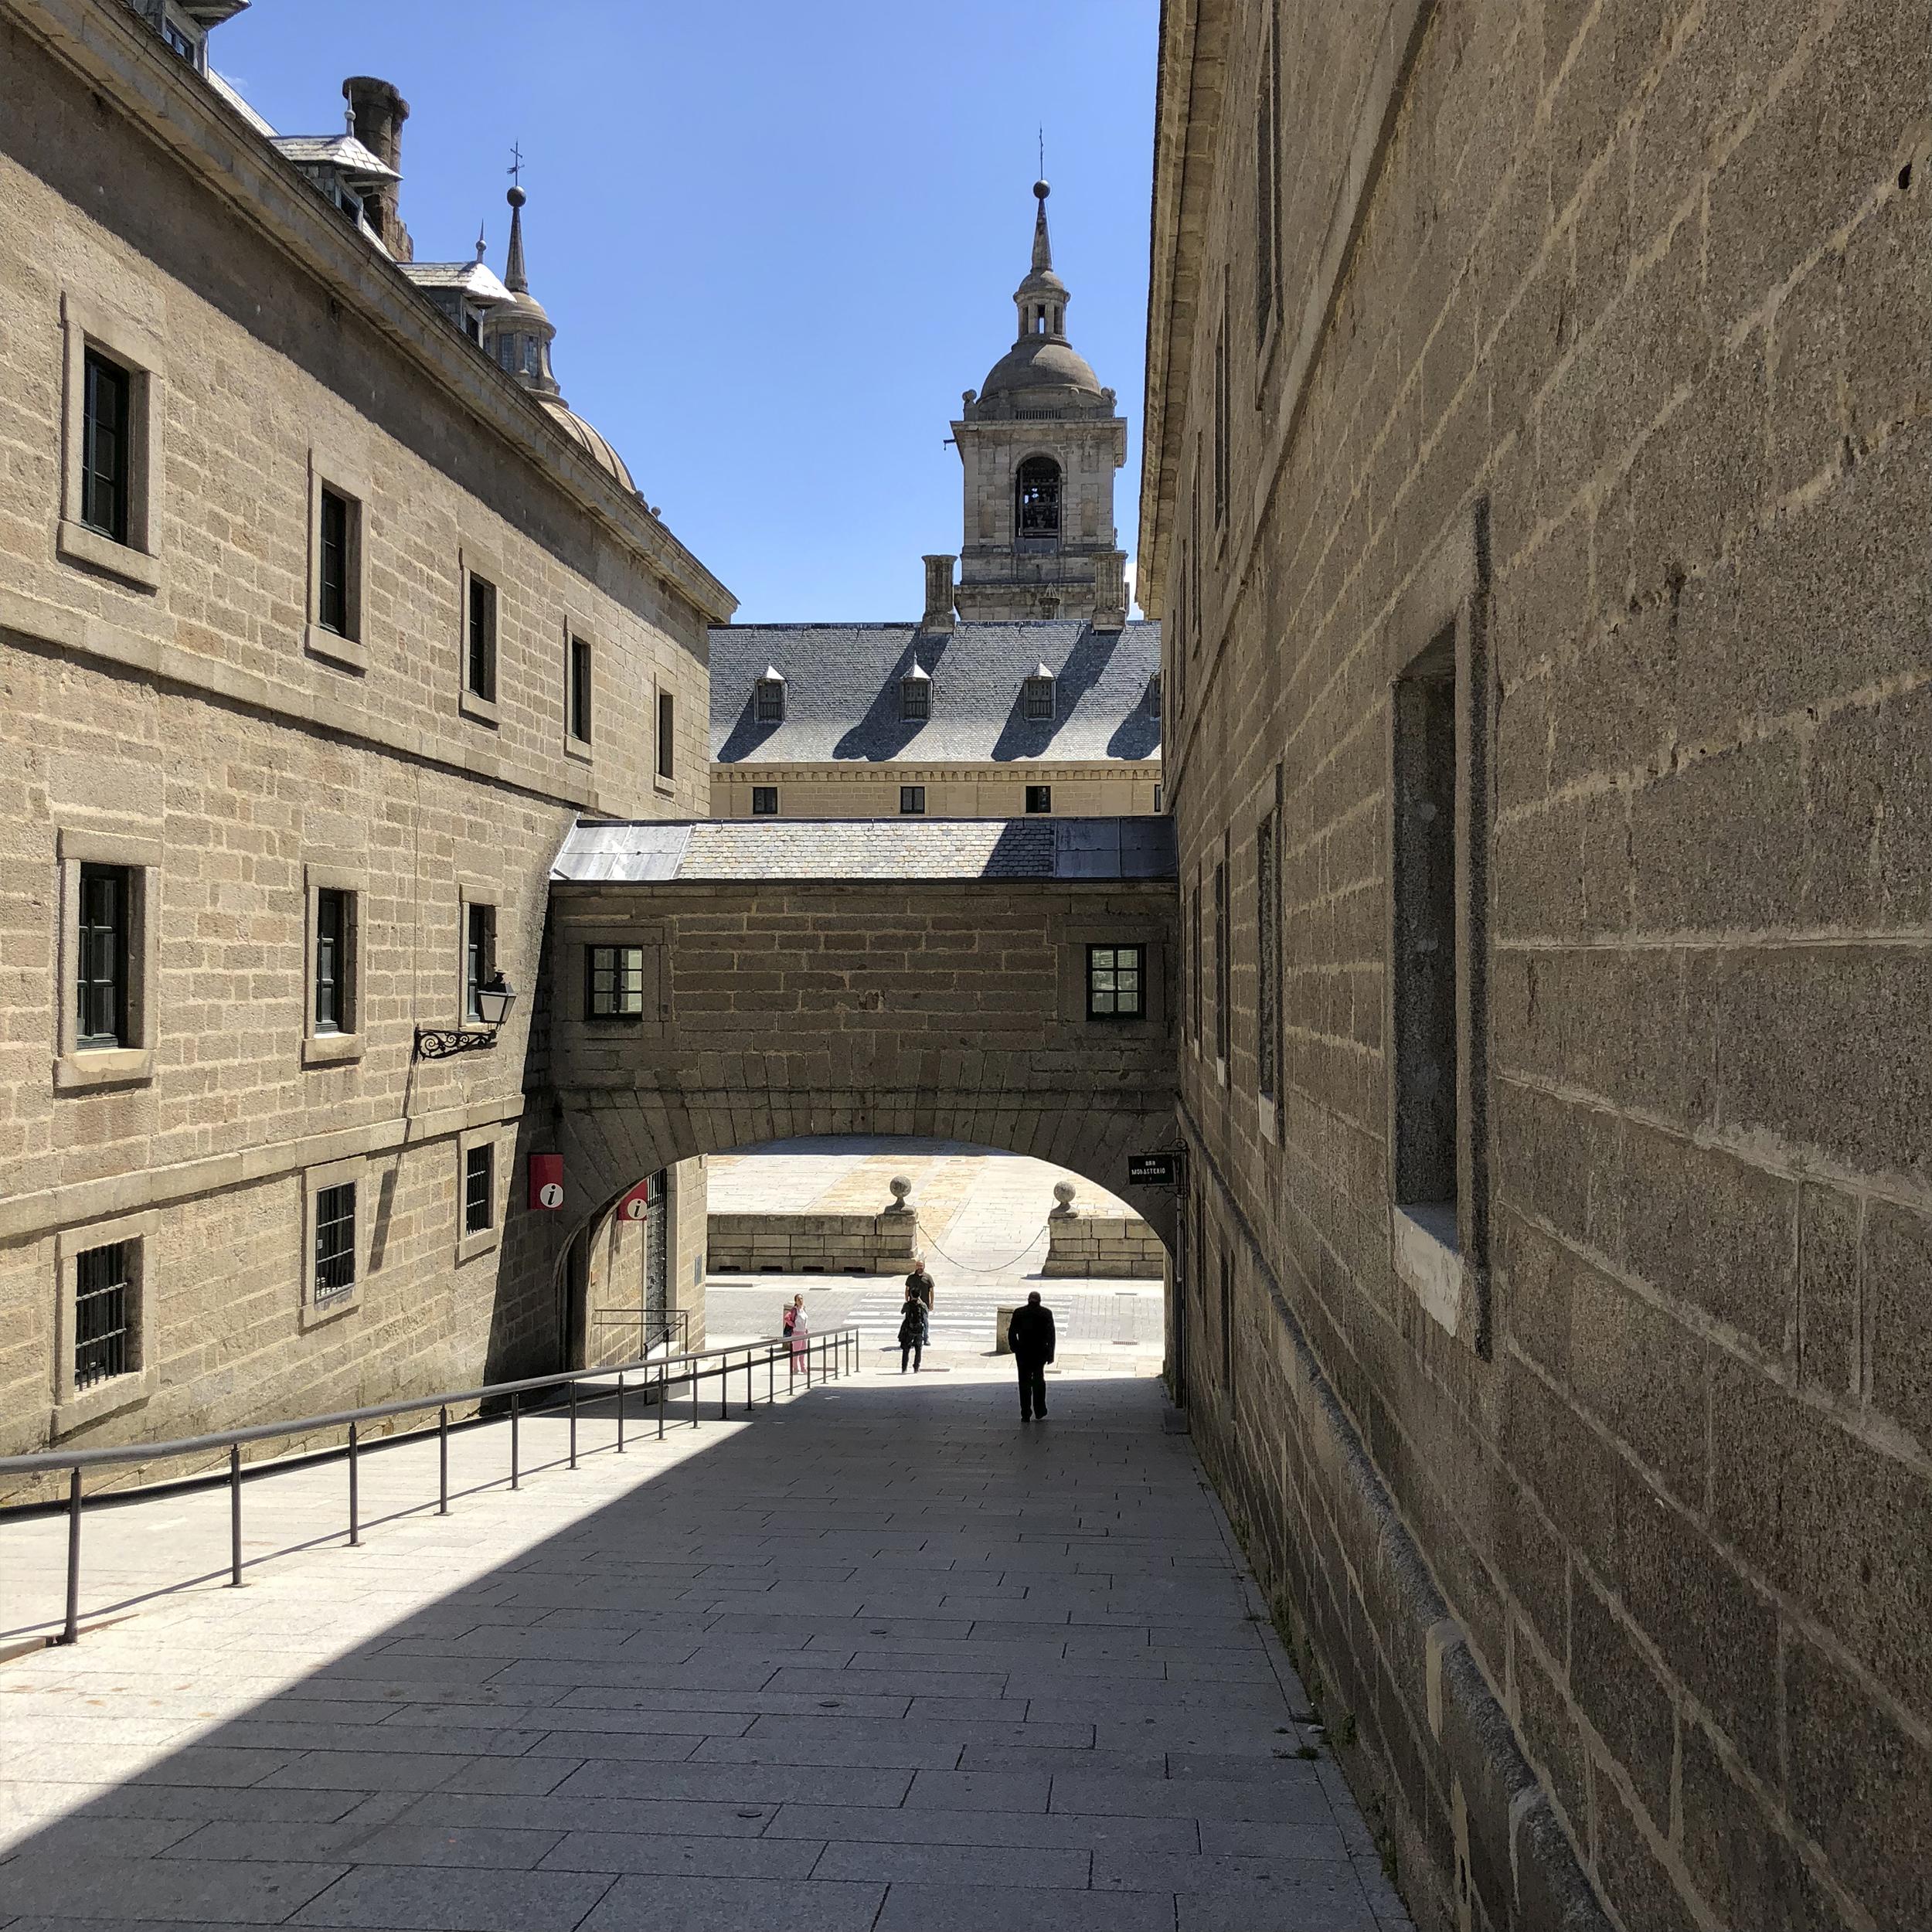 Herrerian architecture.